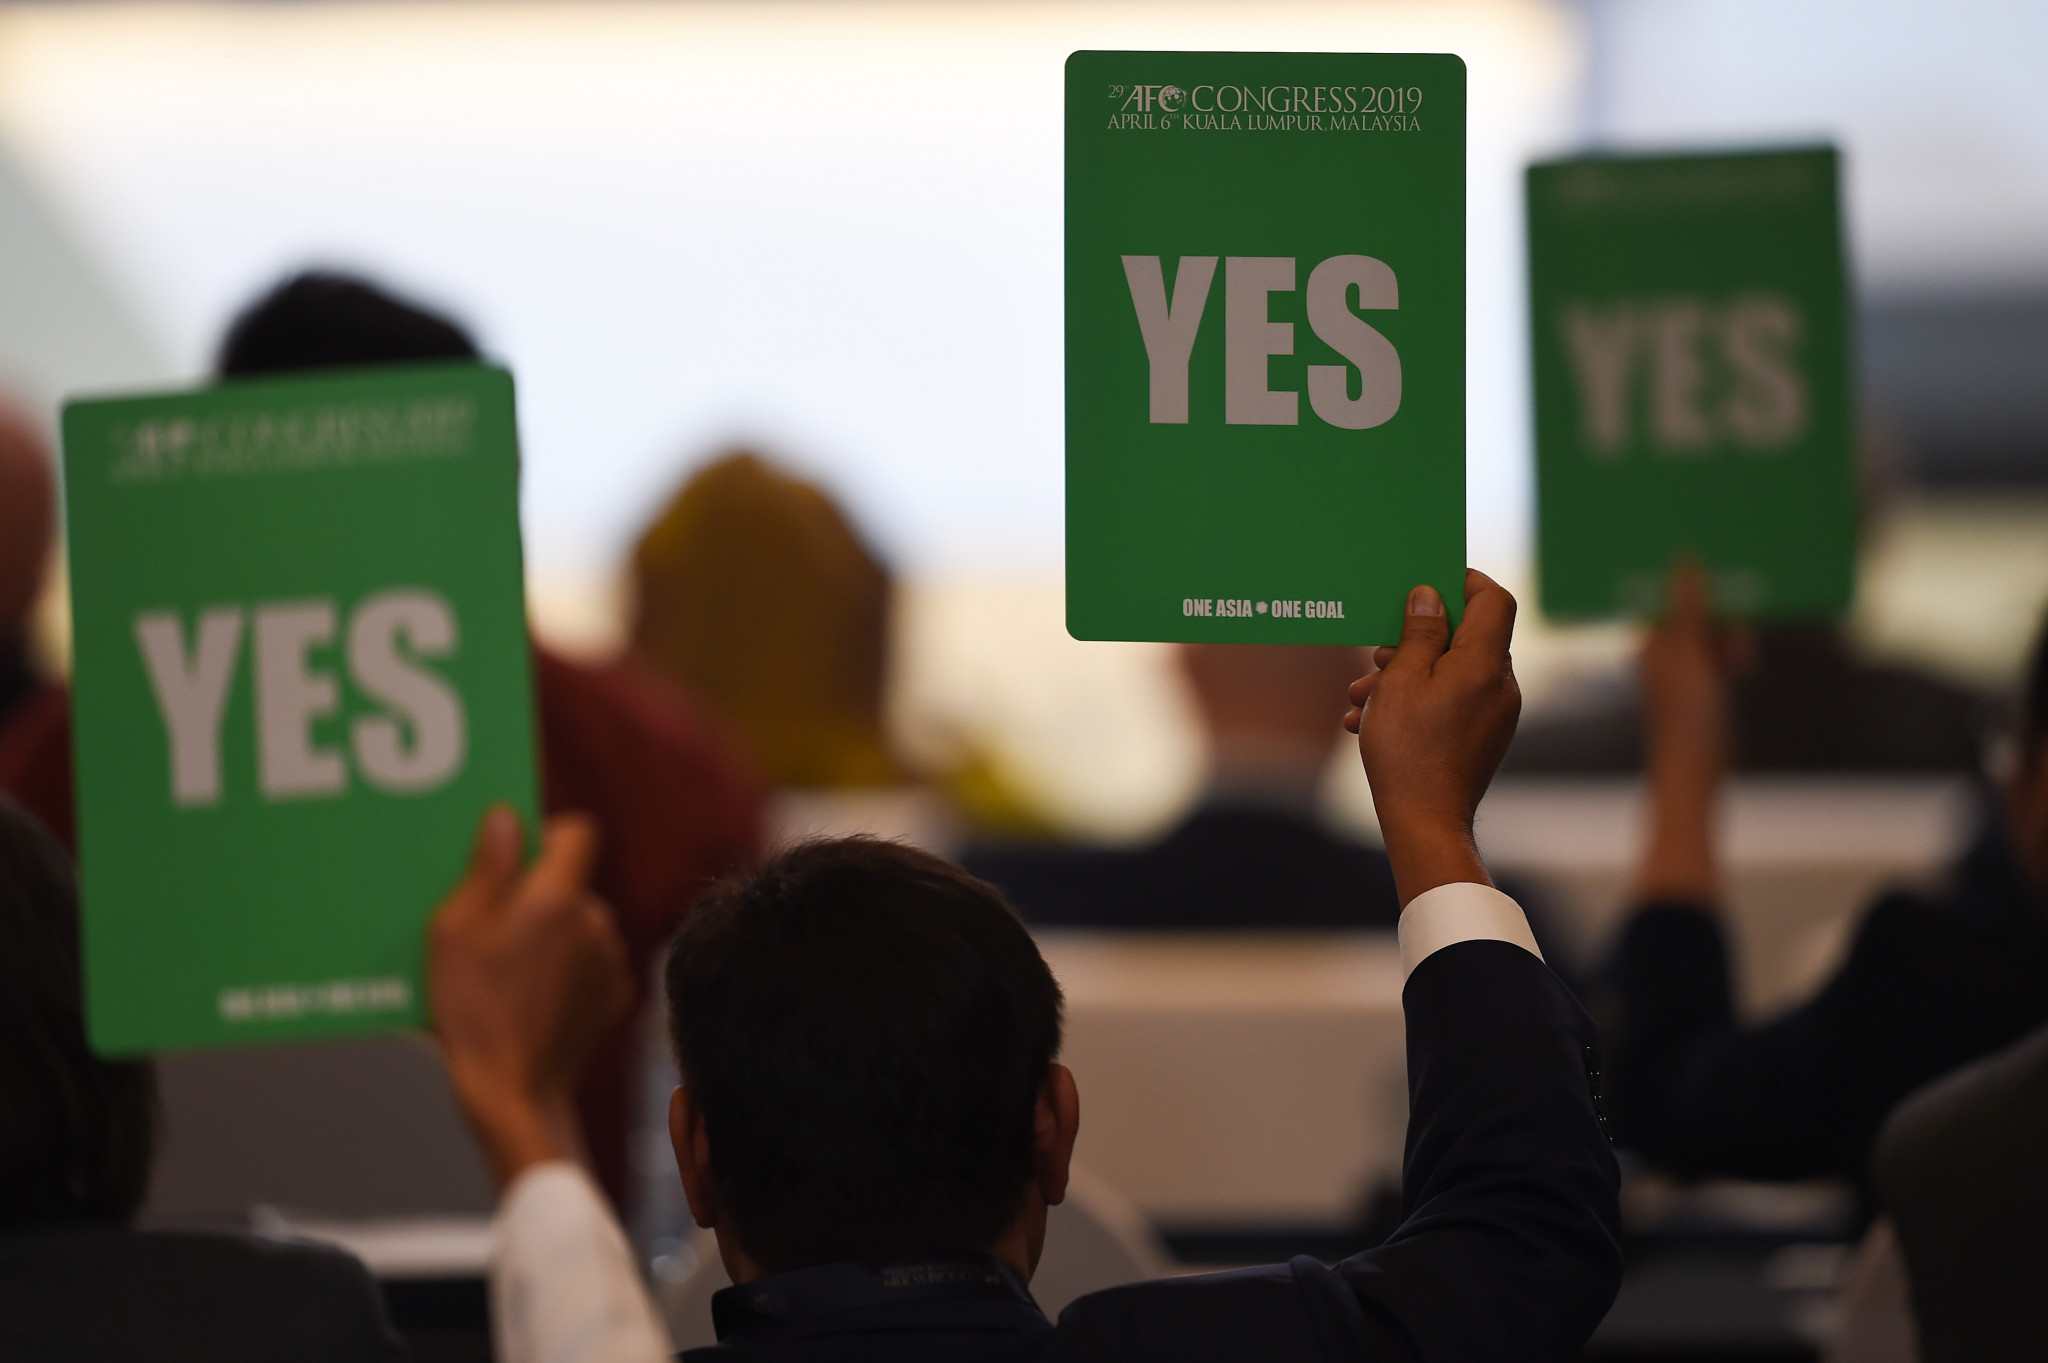 AFC postpone Congress and reschedule women's Olympic qualifier over coronavirus